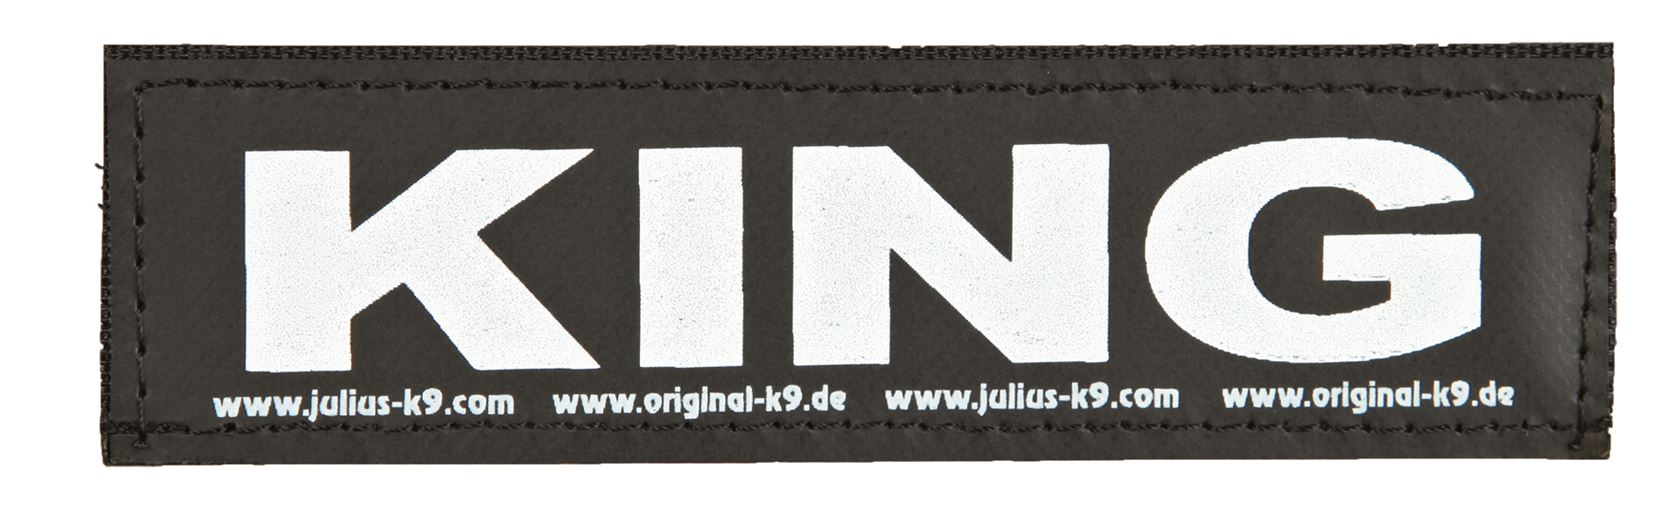 julius-k9 velcro sticker small king (2sts)